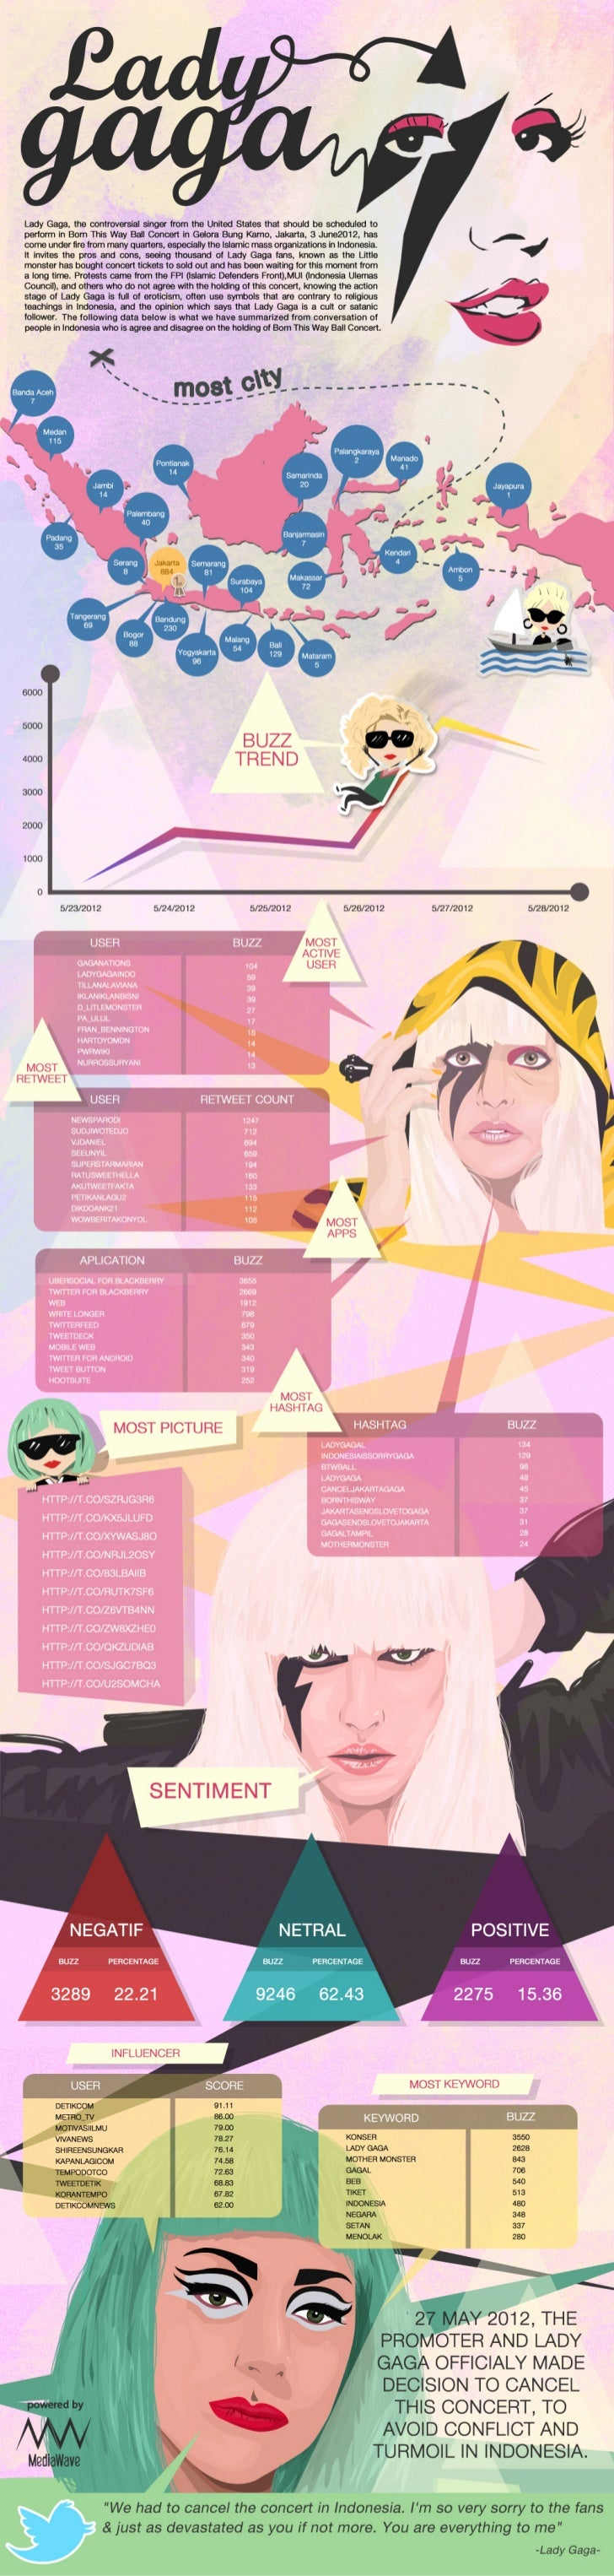 Lady gaga infographic